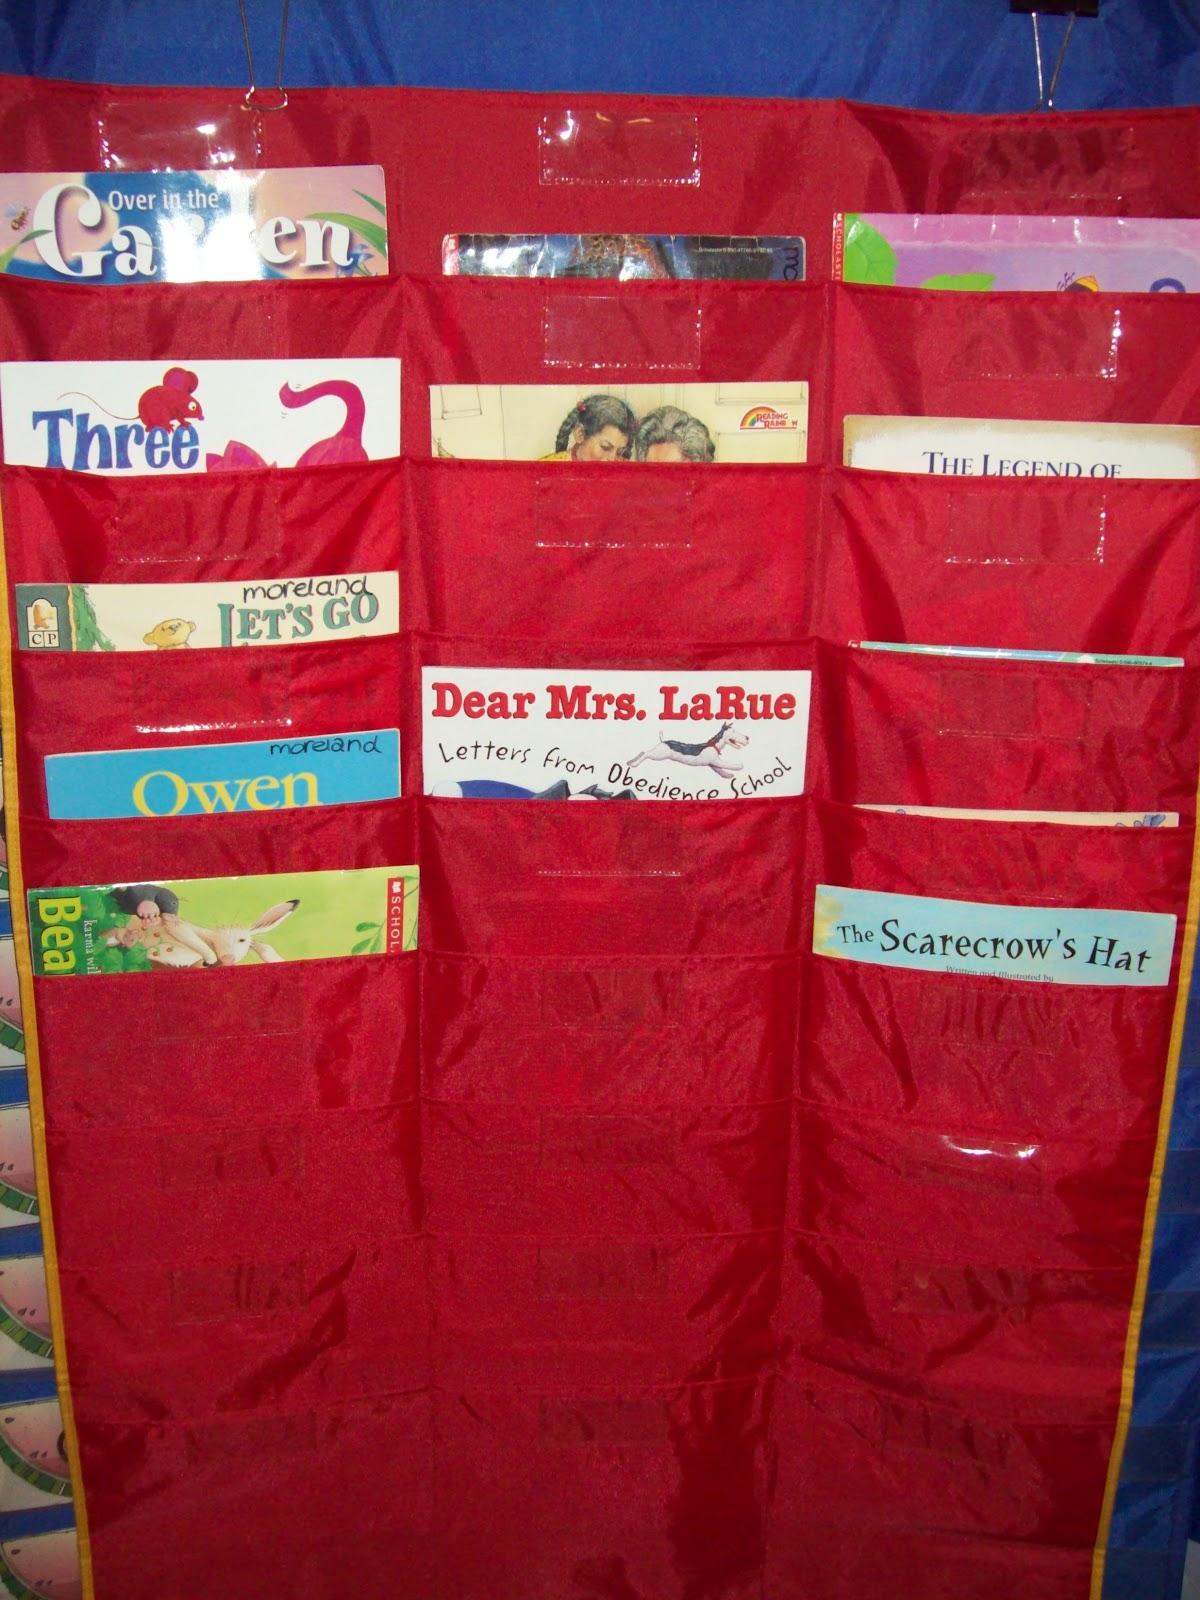 Kinder Garden: Chalk Talk: A Kindergarten Blog: Classroom Library Linky Party